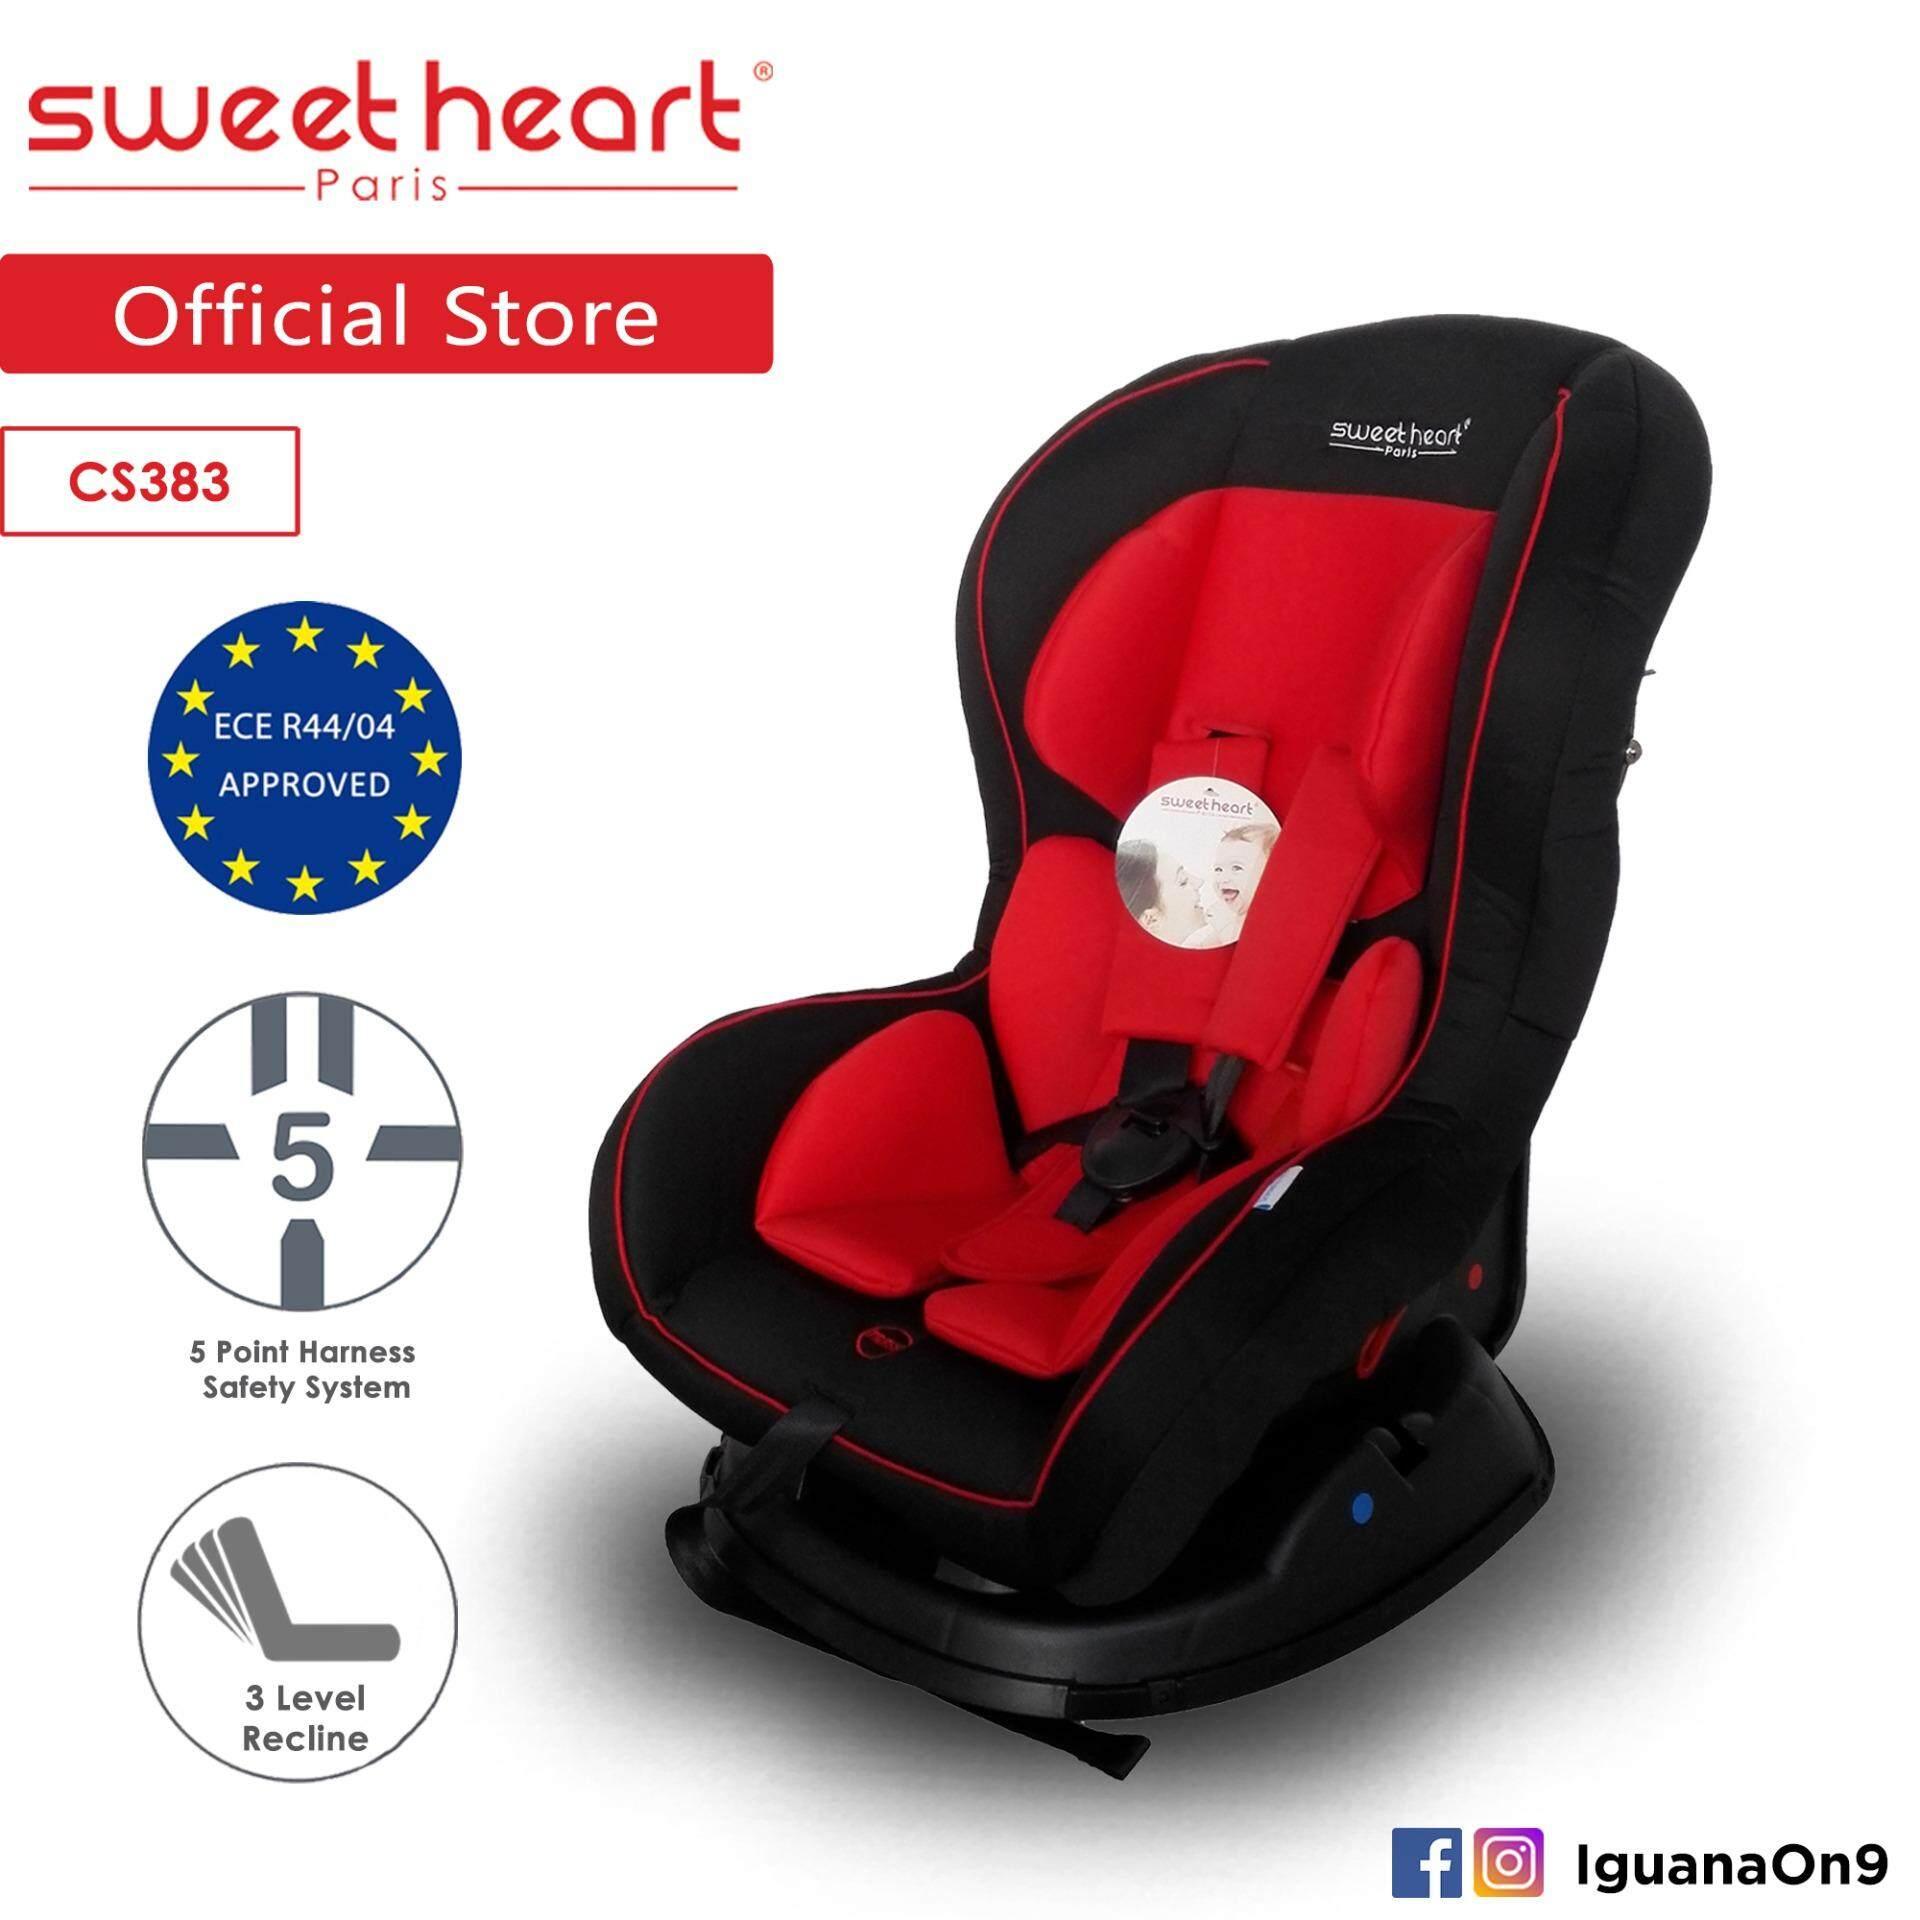 a1004d7c9cf Sweet Heart Paris CS383 Car Seat (Red) with High Impact Material